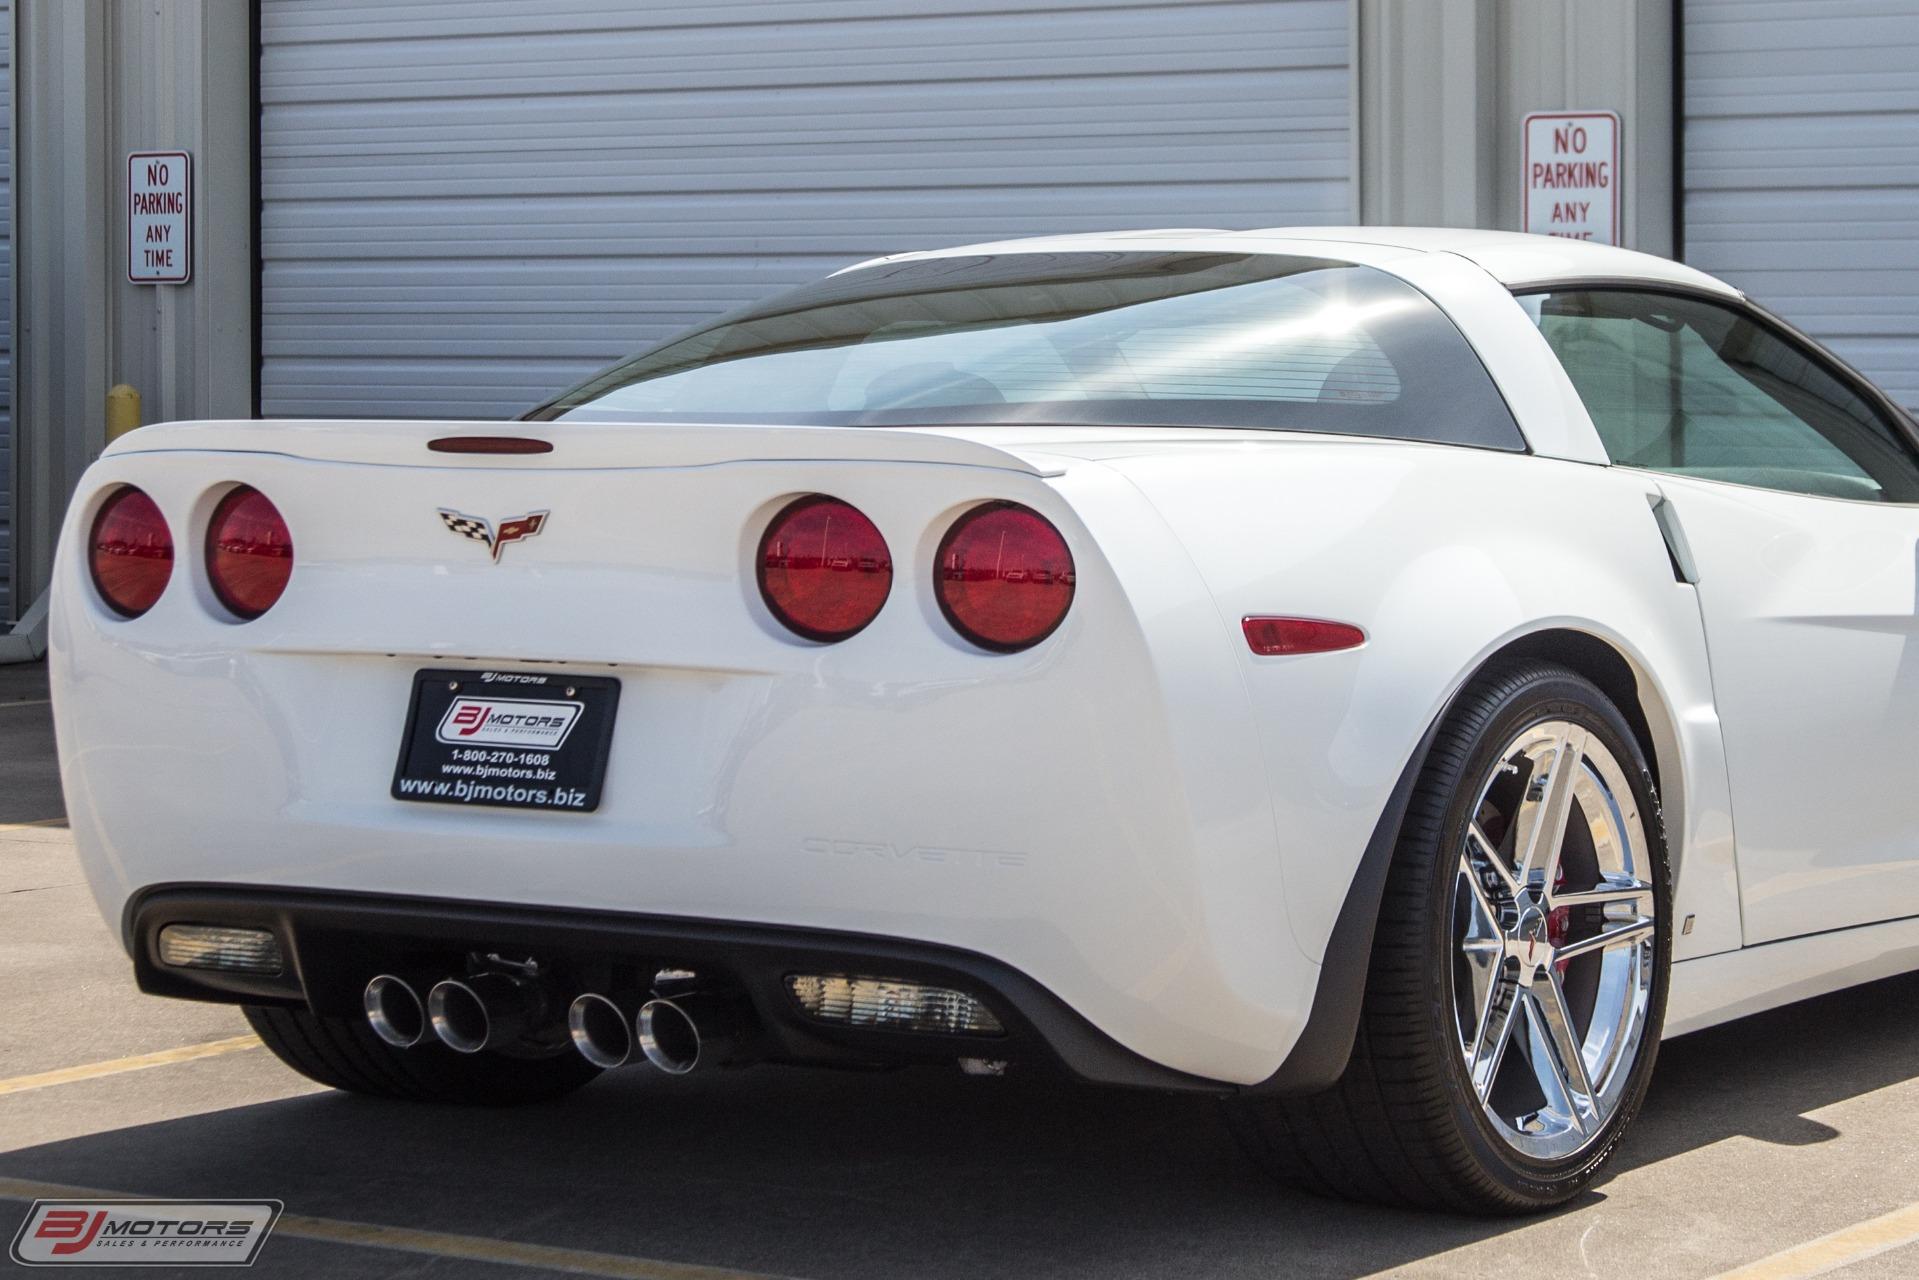 Used-2007-Chevrolet-Corvette-Ron-Fellows-Edition-Z06